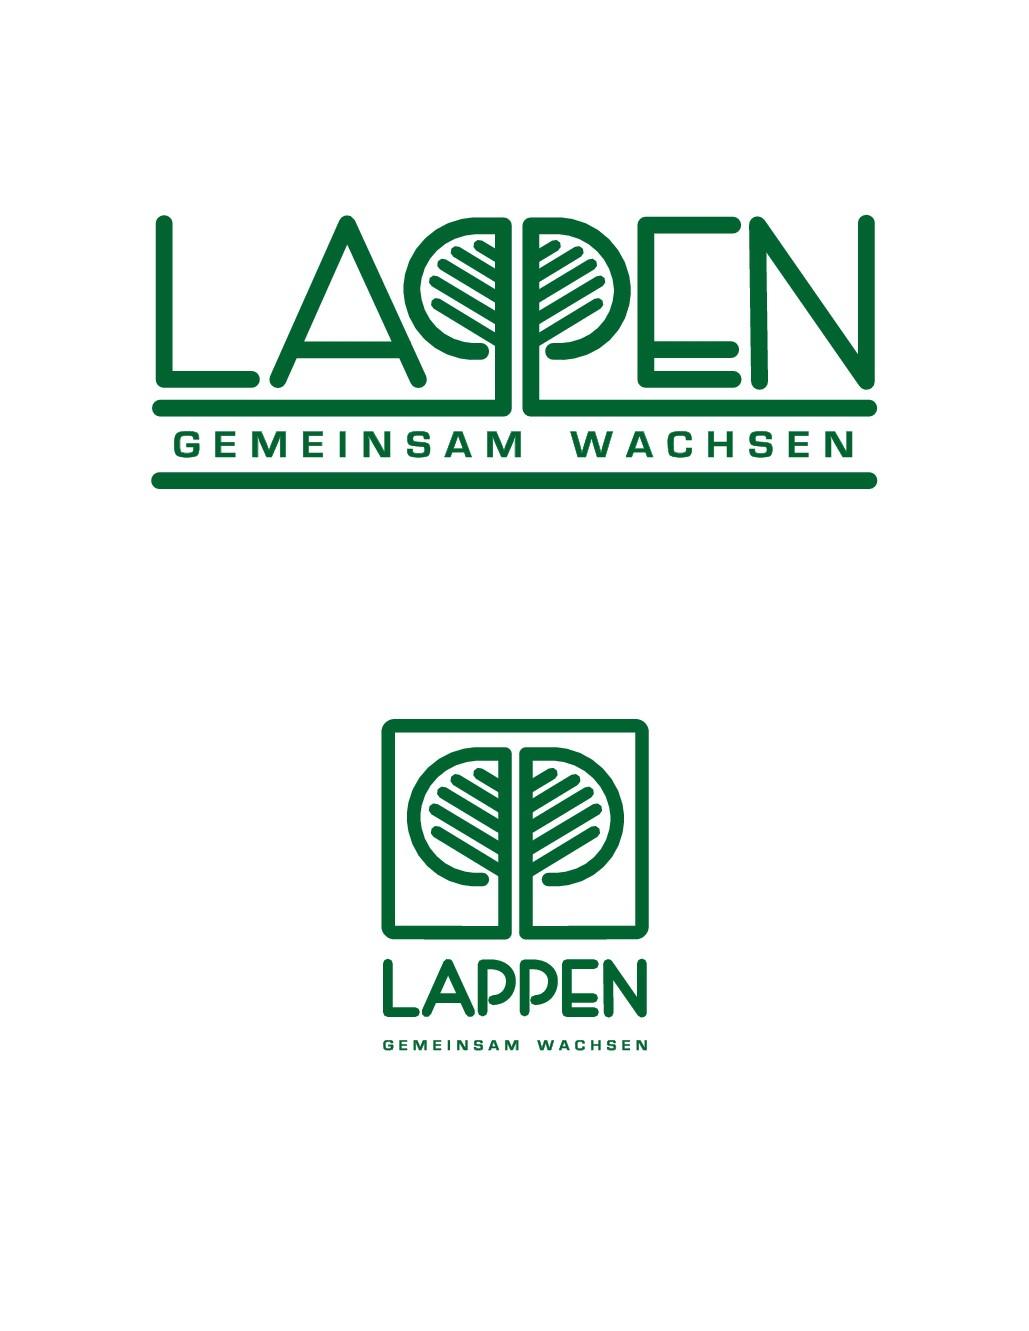 Design a new logo for a tree nursery